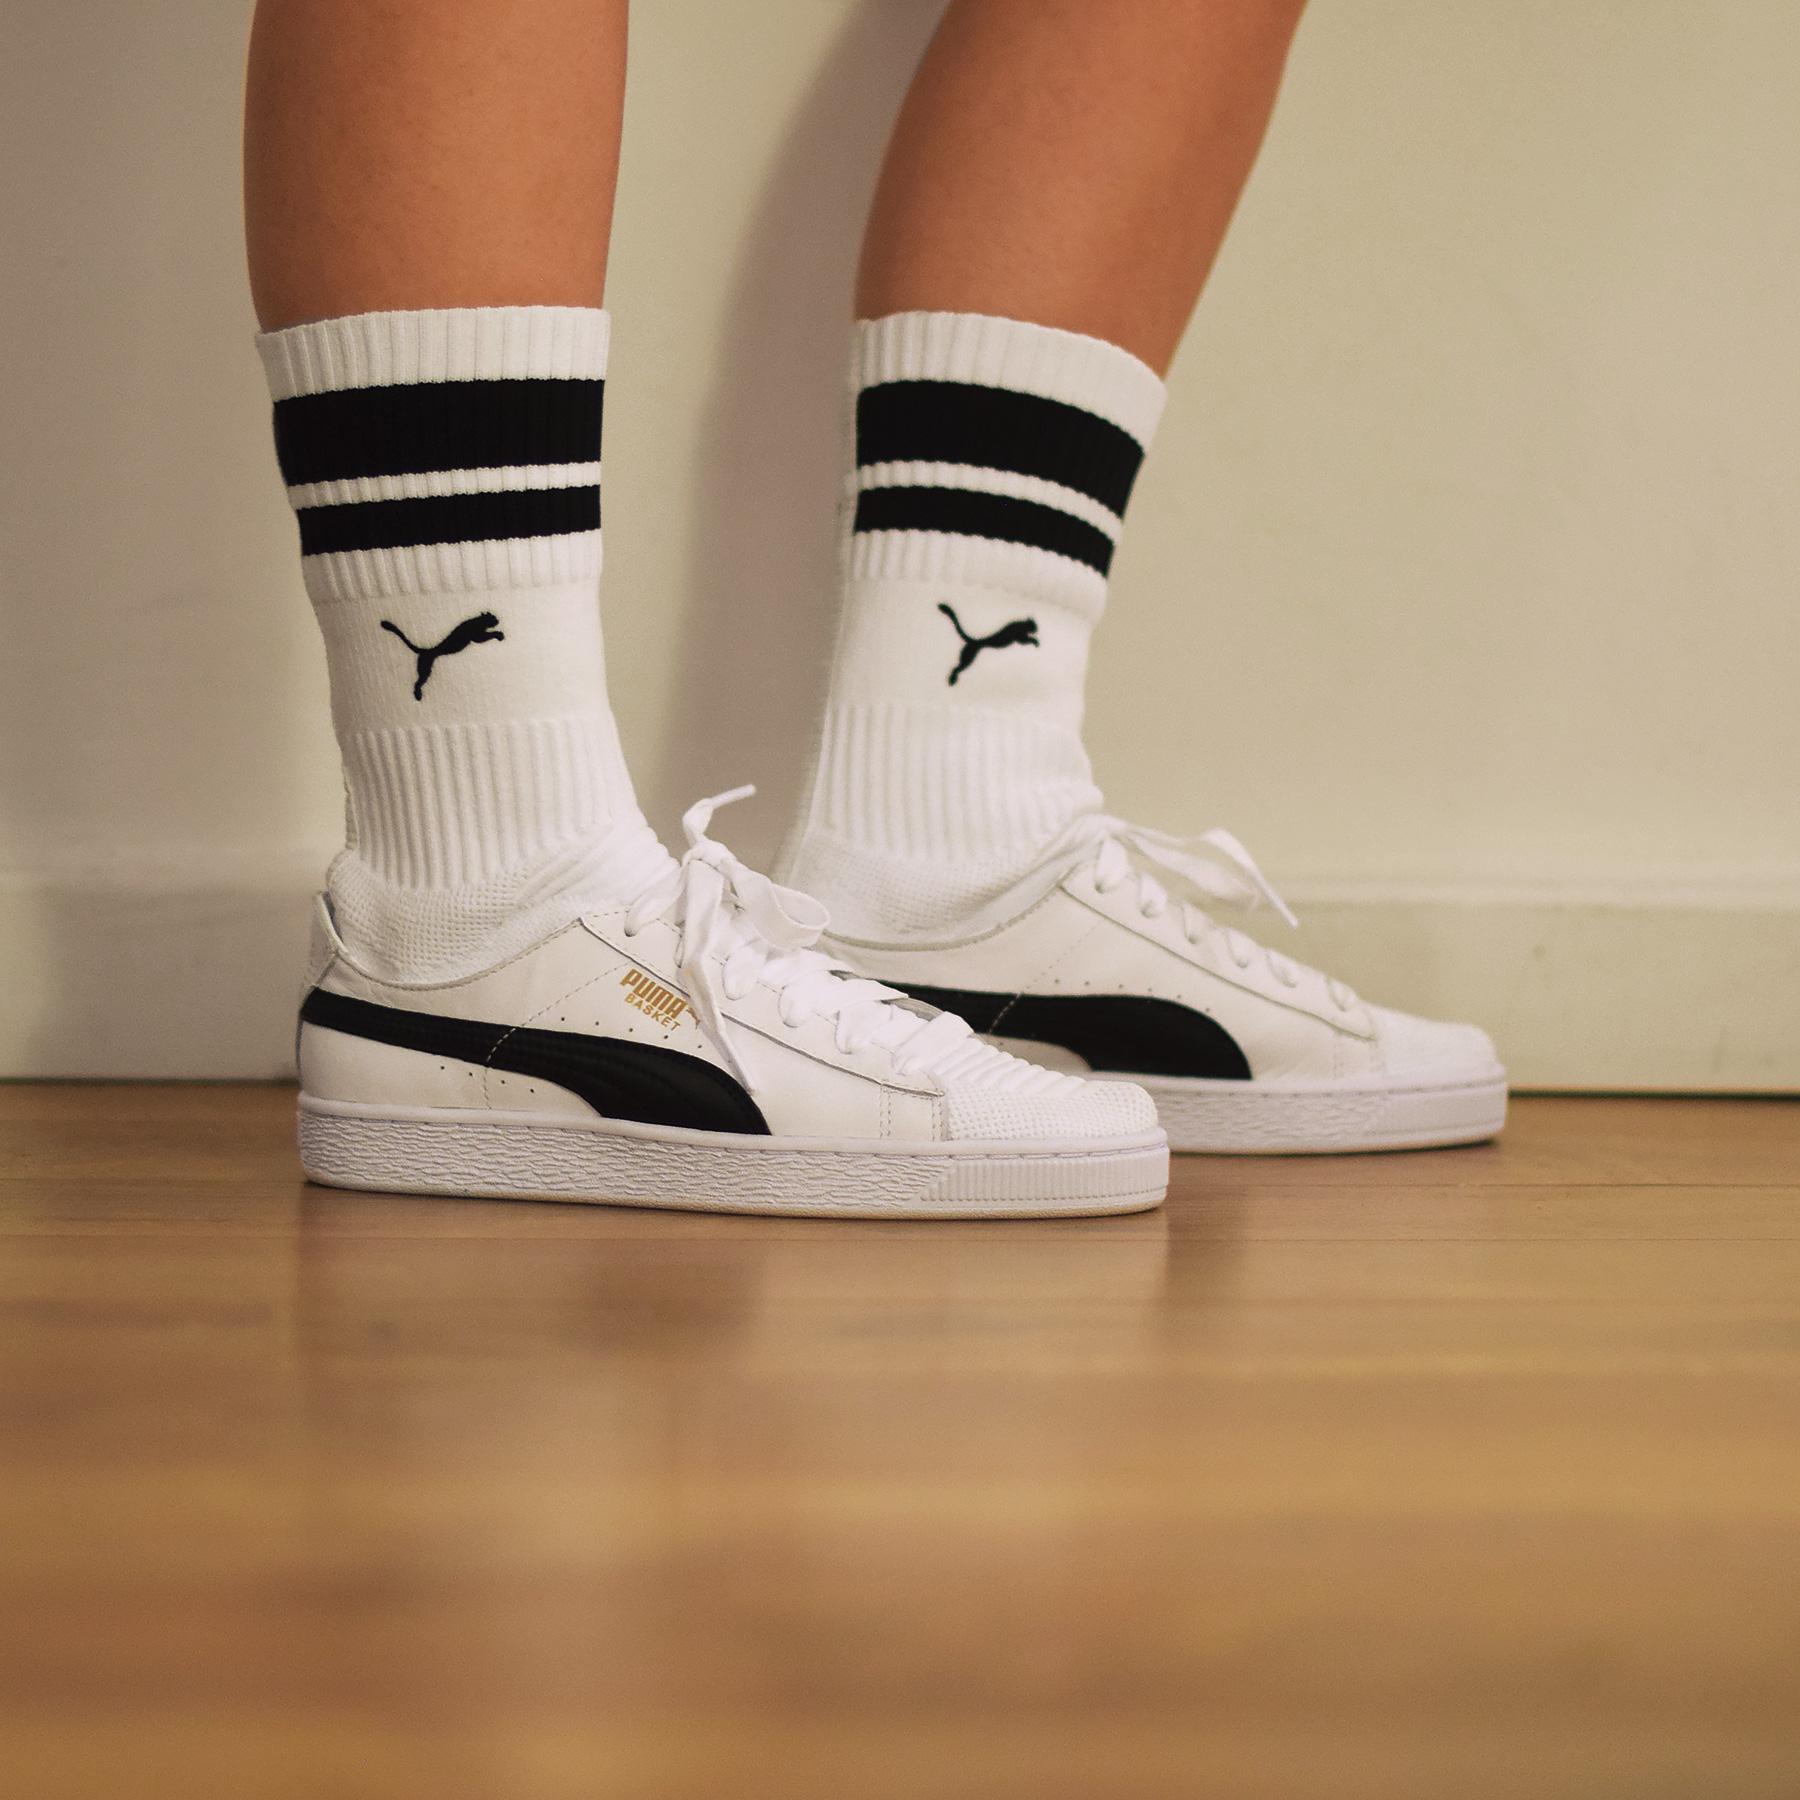 Puma basket chaussette